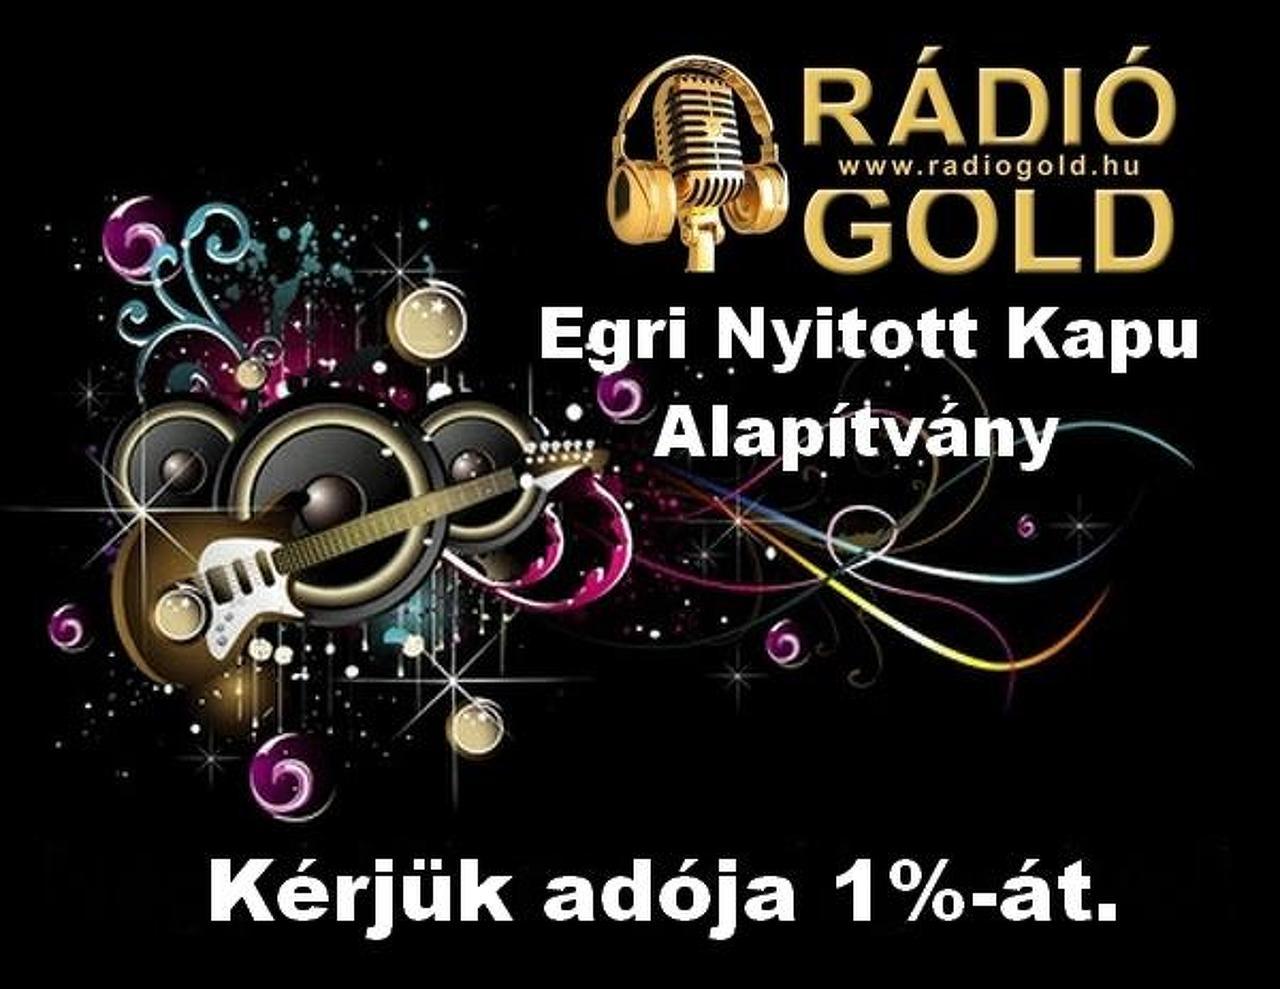 Gold Rádió